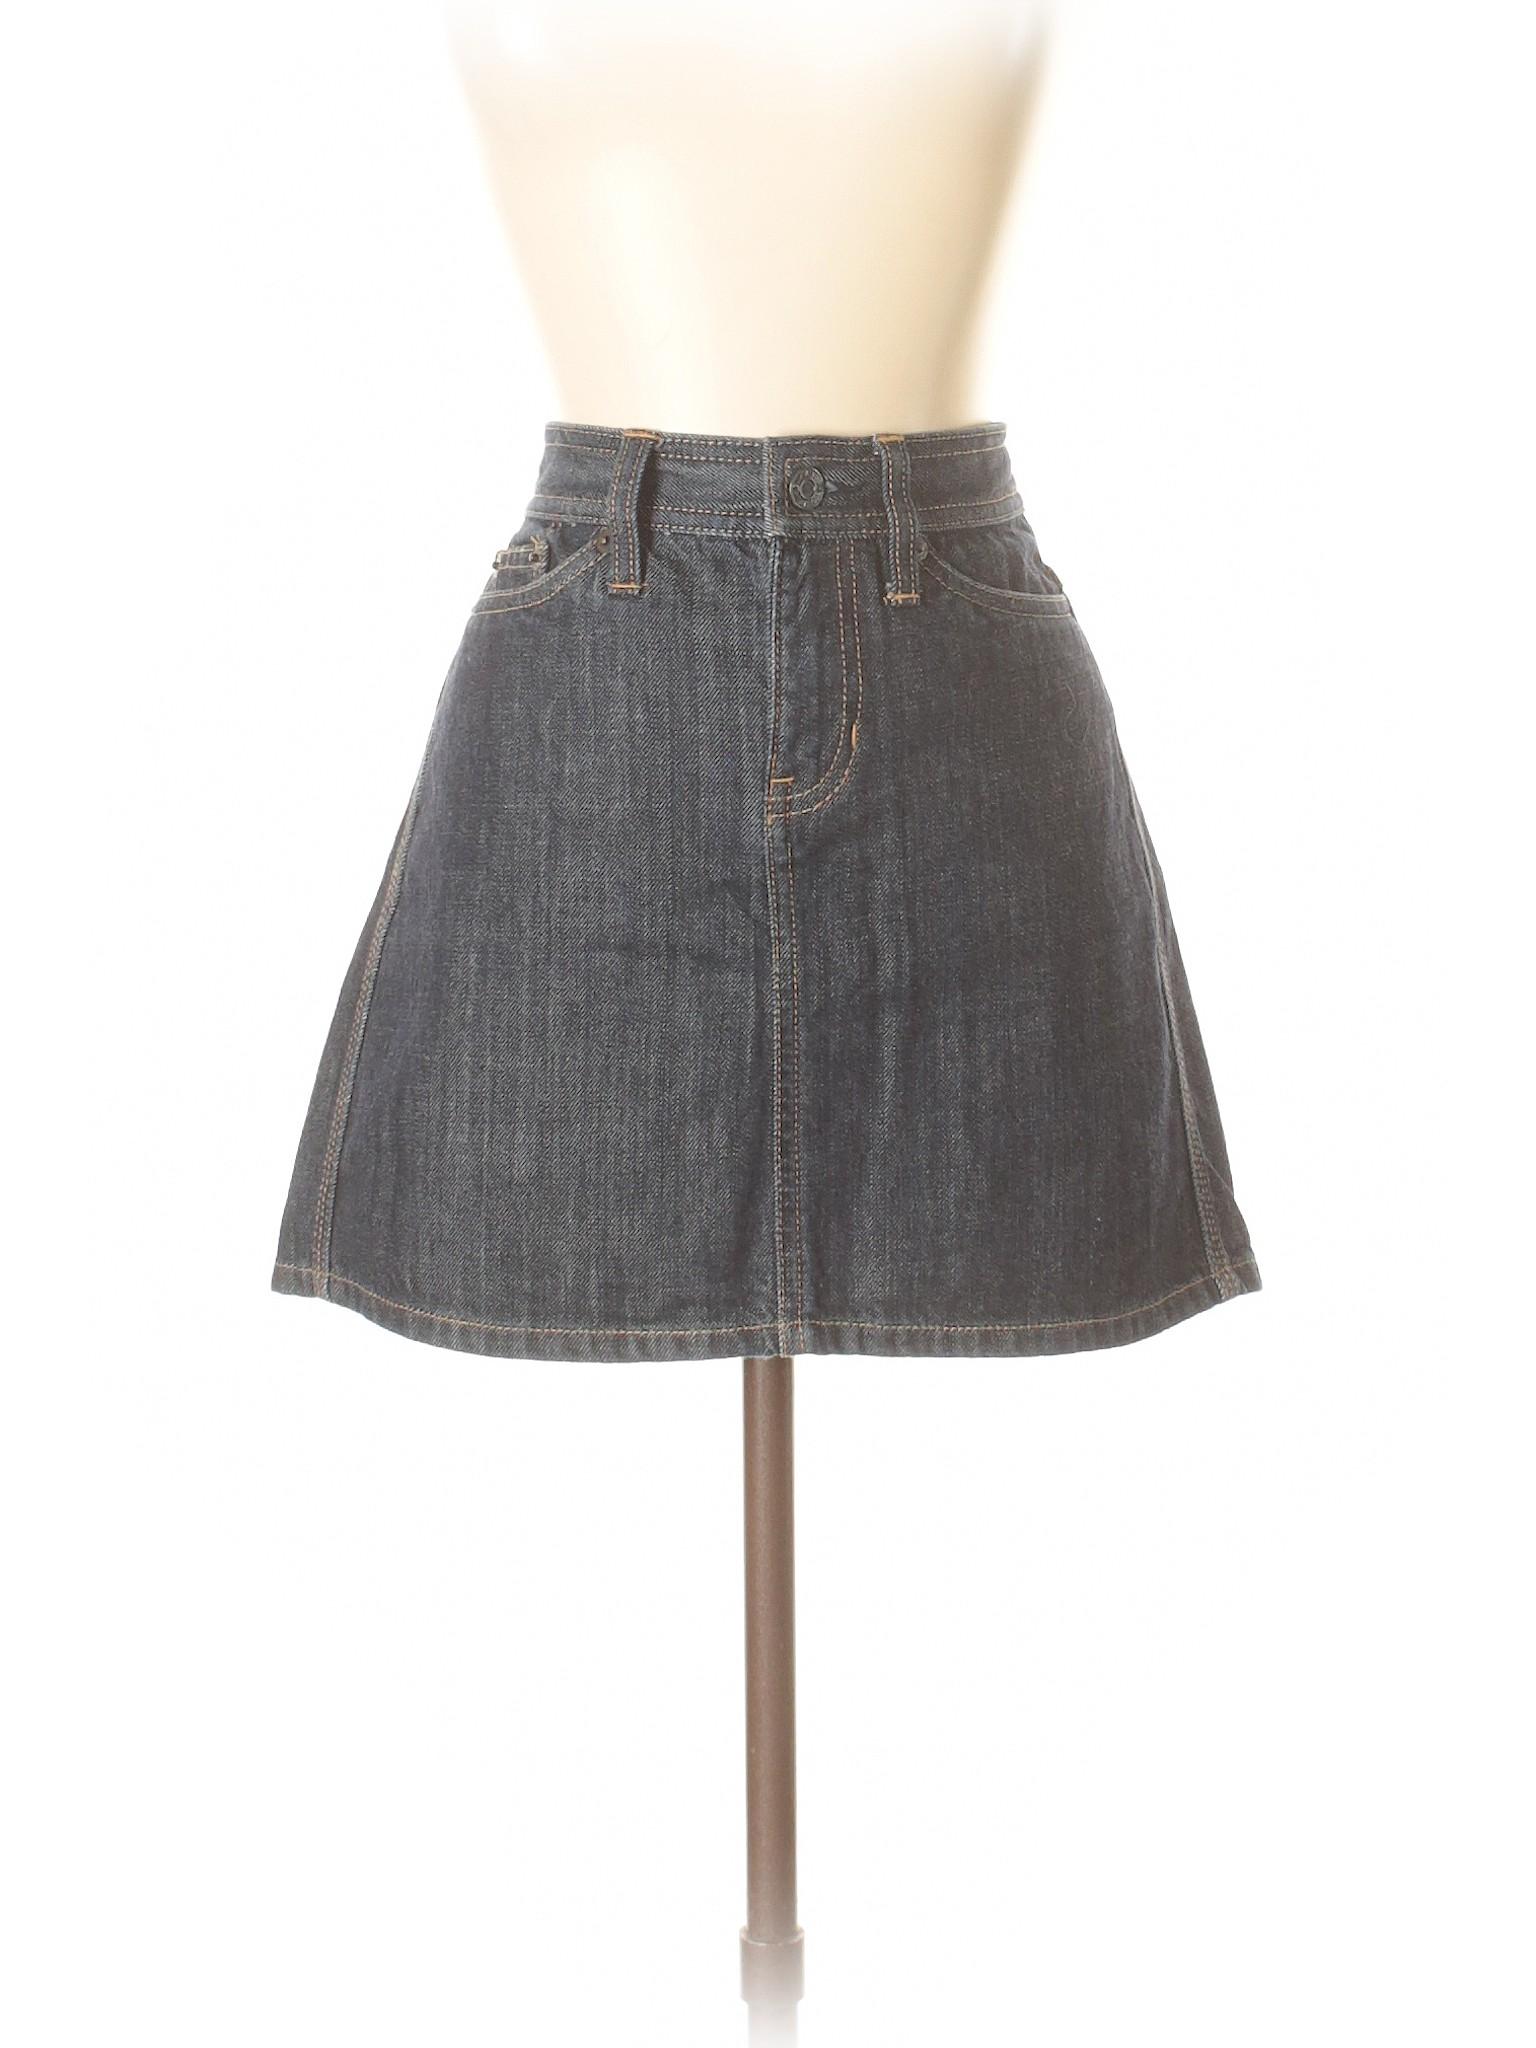 Boutique Denim Boutique Skirt Denim Skirt Denim Denim Boutique Skirt Skirt Boutique Eq45CWHCa